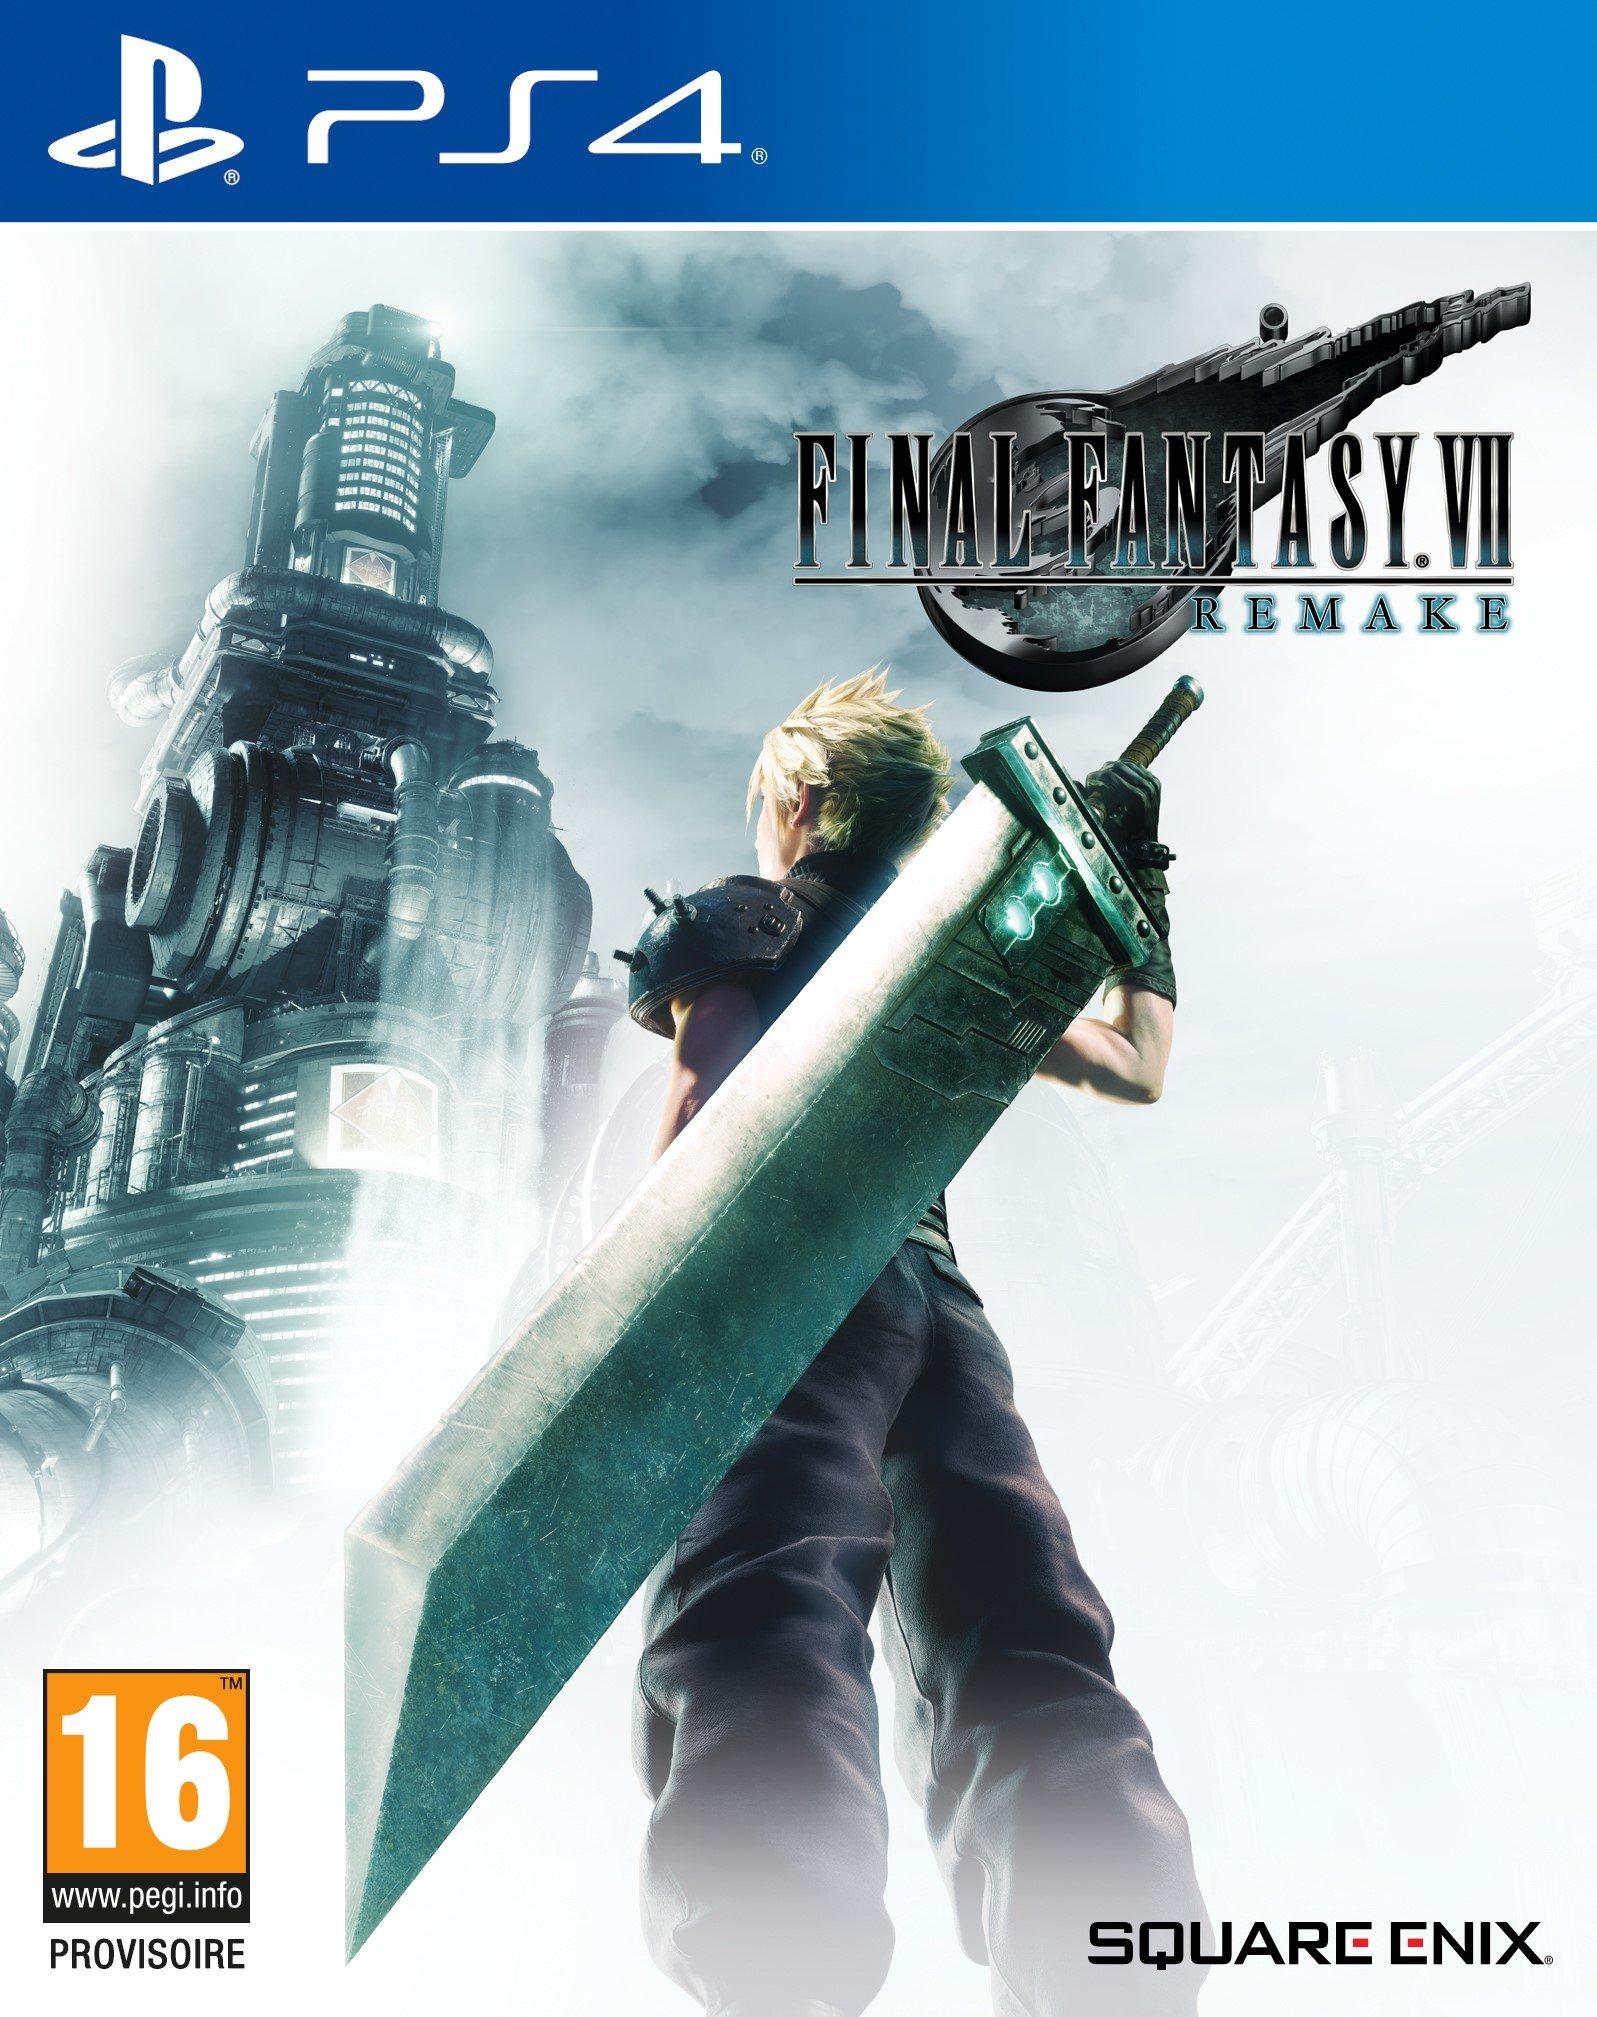 jaquette du jeu vidéo Final Fantasy VII Remake